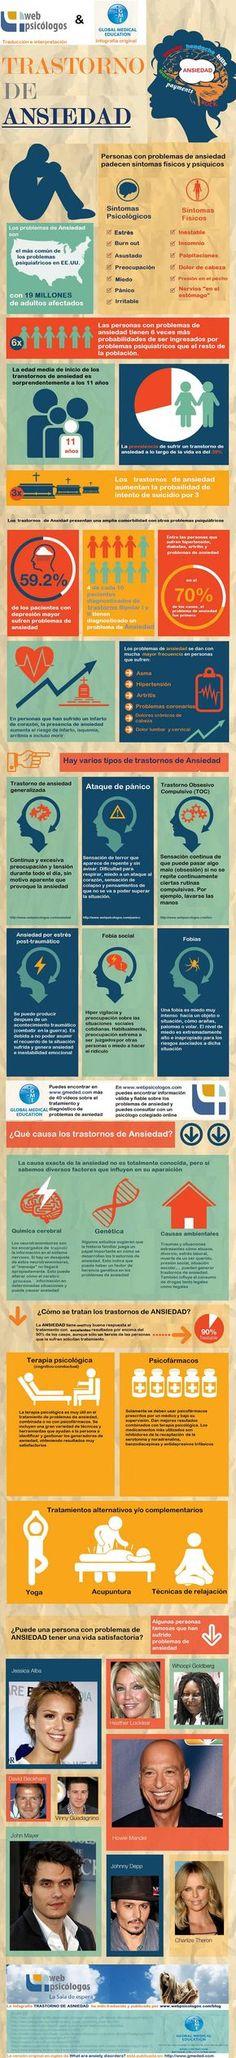 Trastorno de ansiedad #infografia #infographic #health